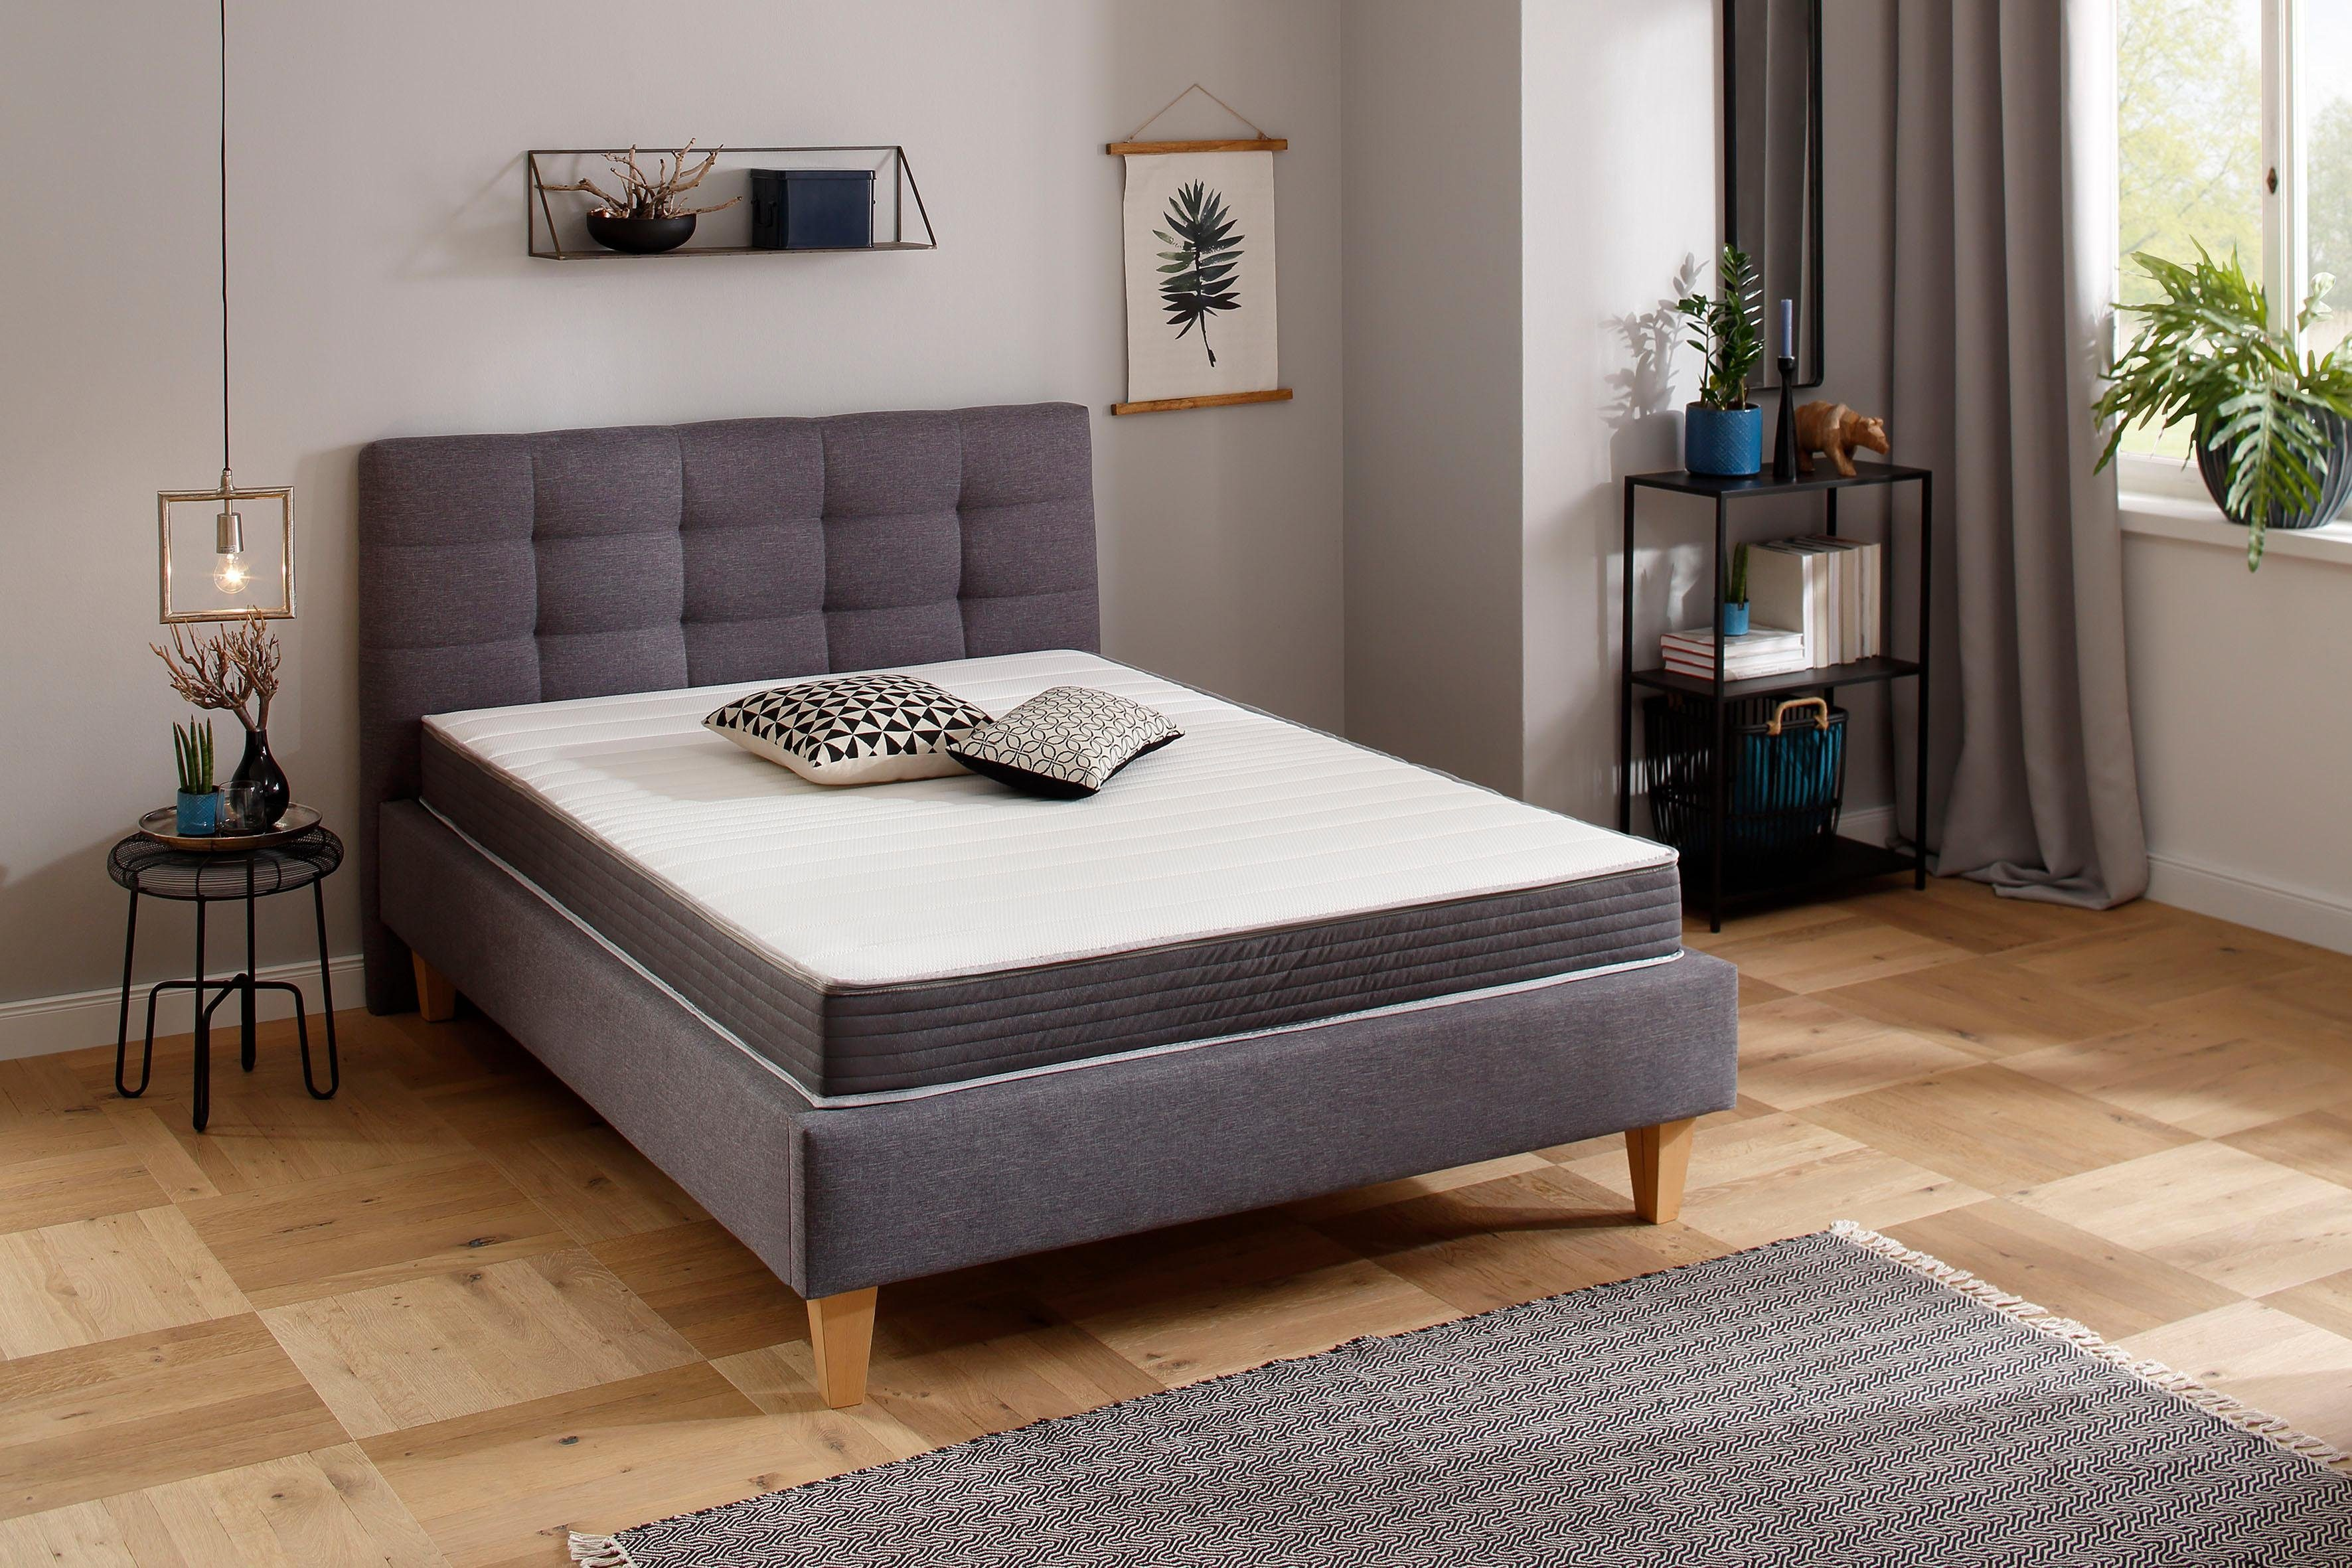 Komfortschaummatratze Nova Universal Beco 17 cm hoch